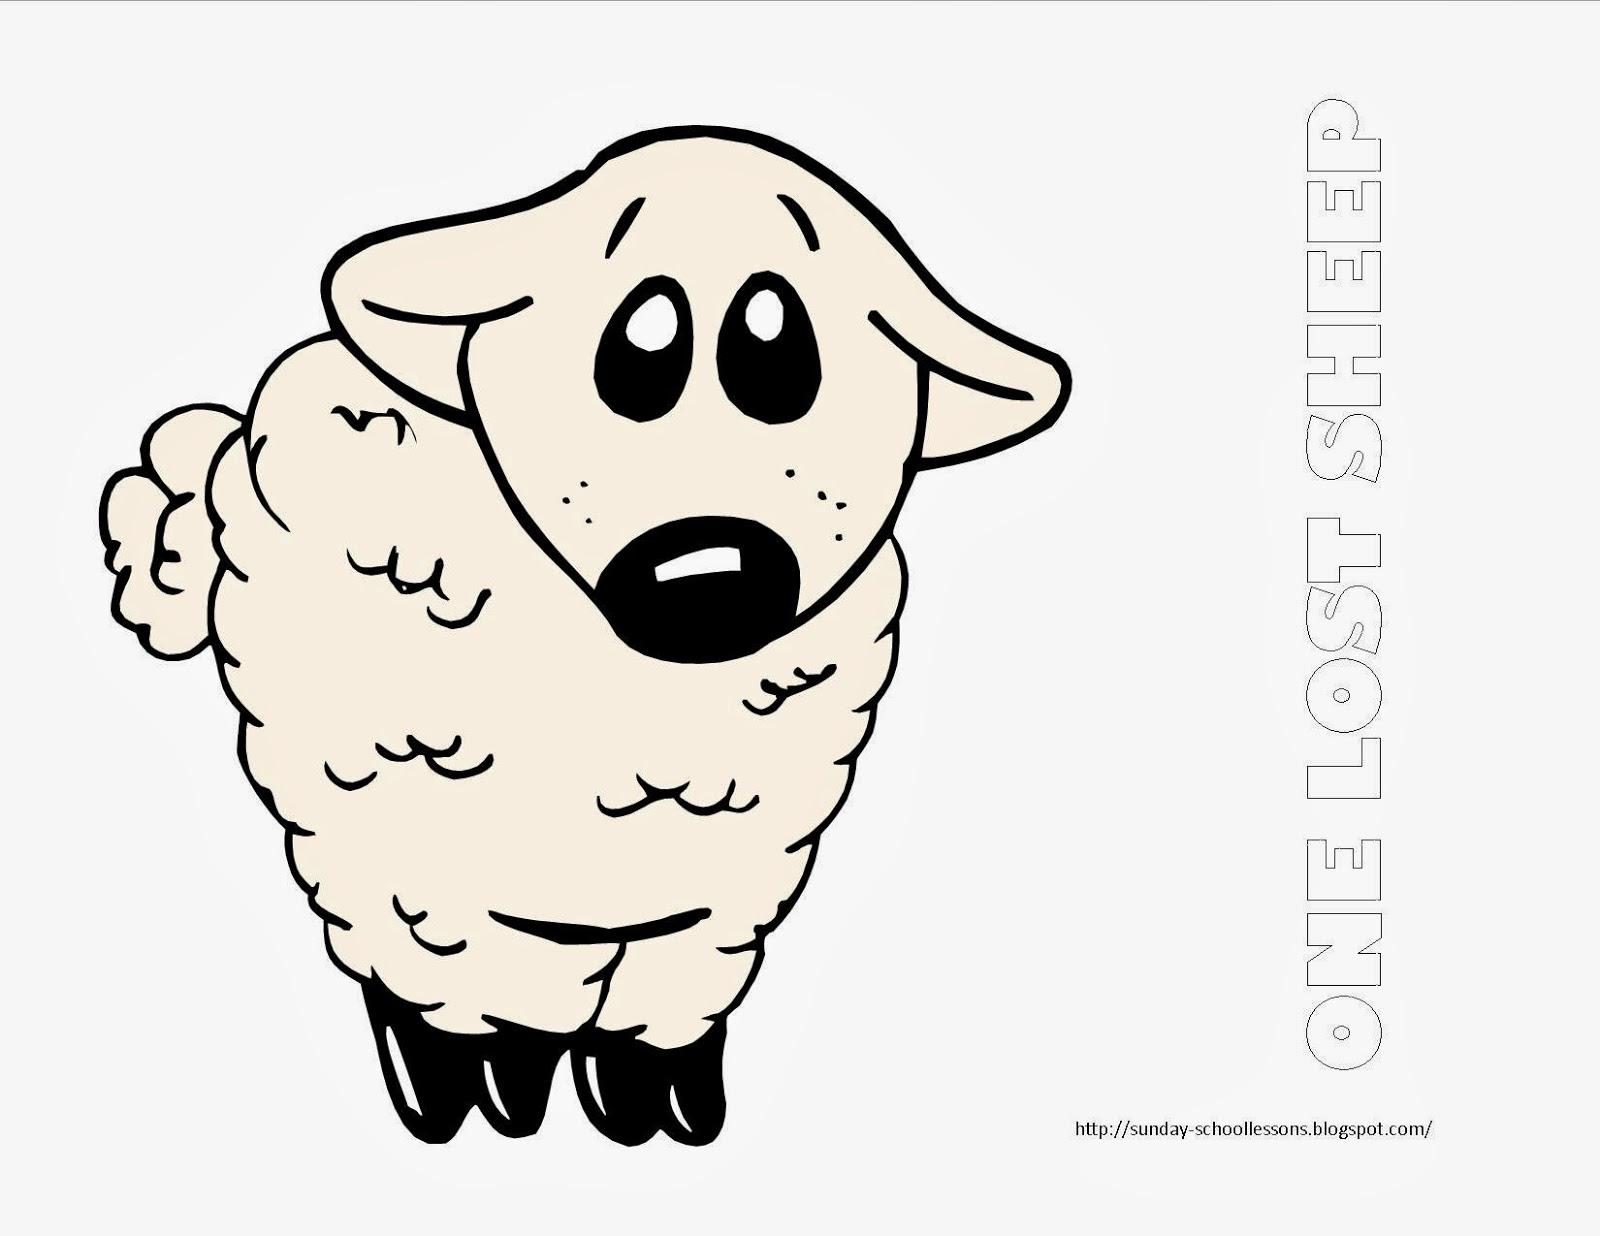 Coloring Page Of A Sheep - Eskayalitim